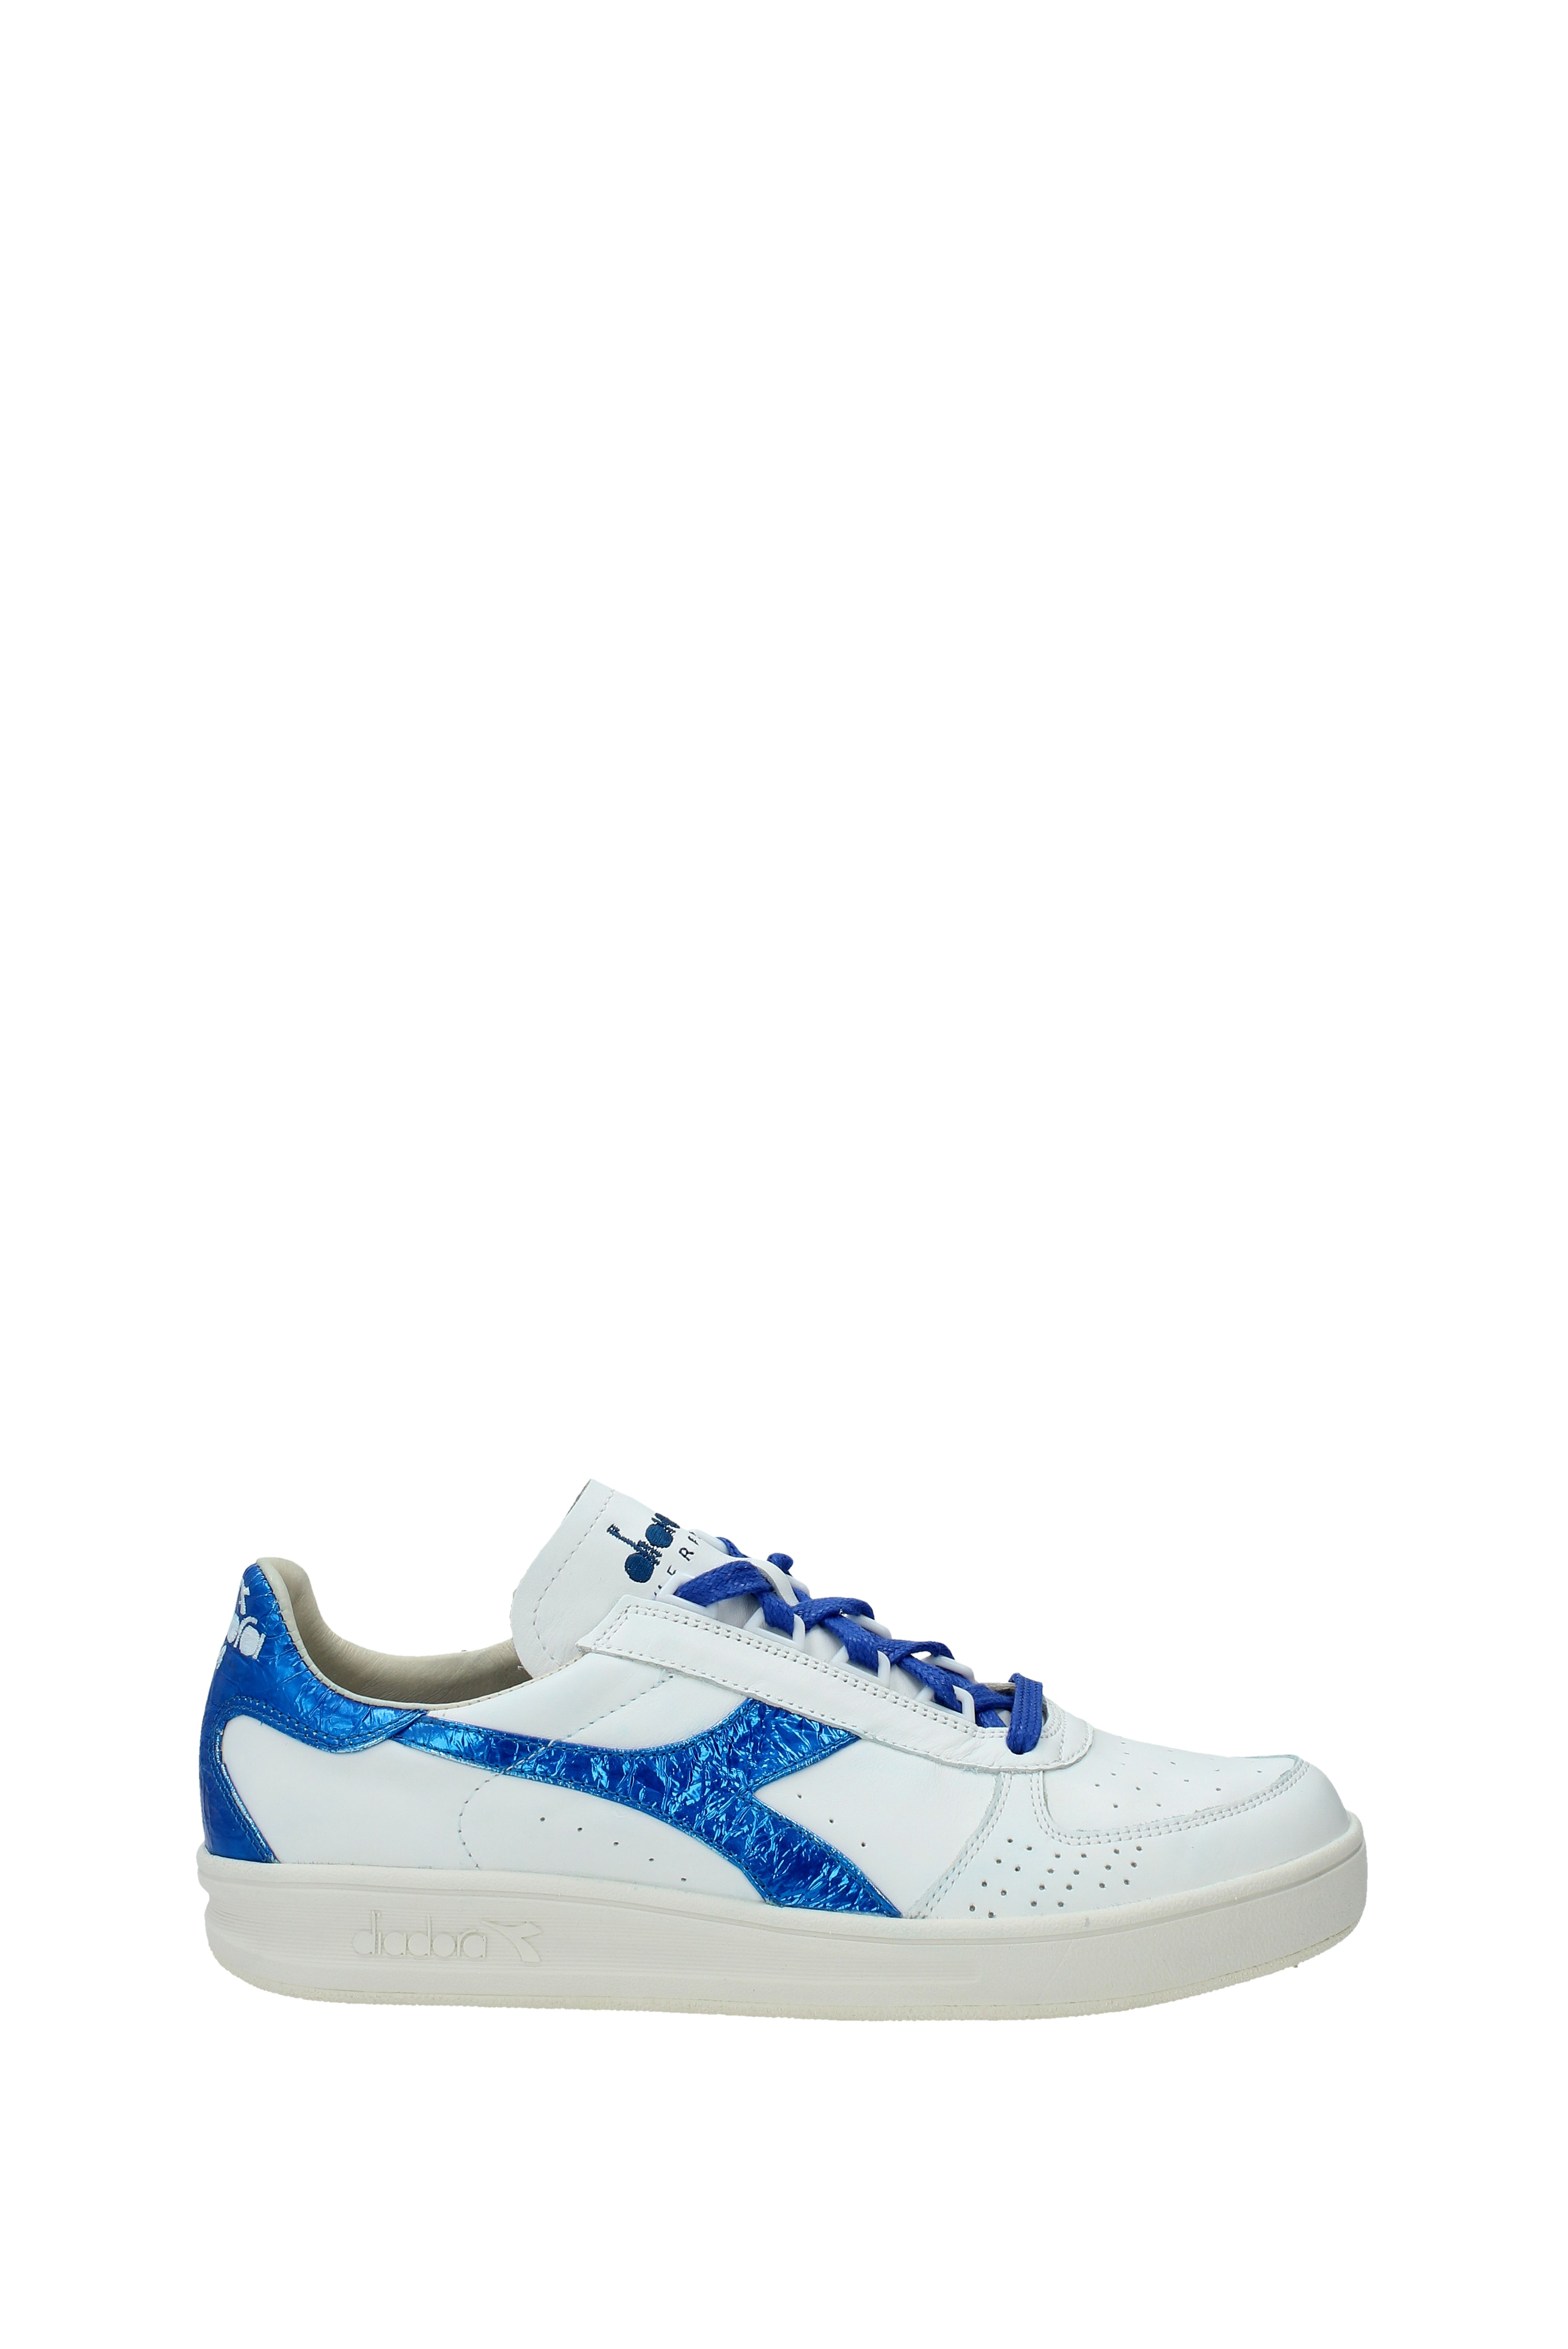 Sneakers Diadora Heritage Herren - Leder (UOMO20117254701)